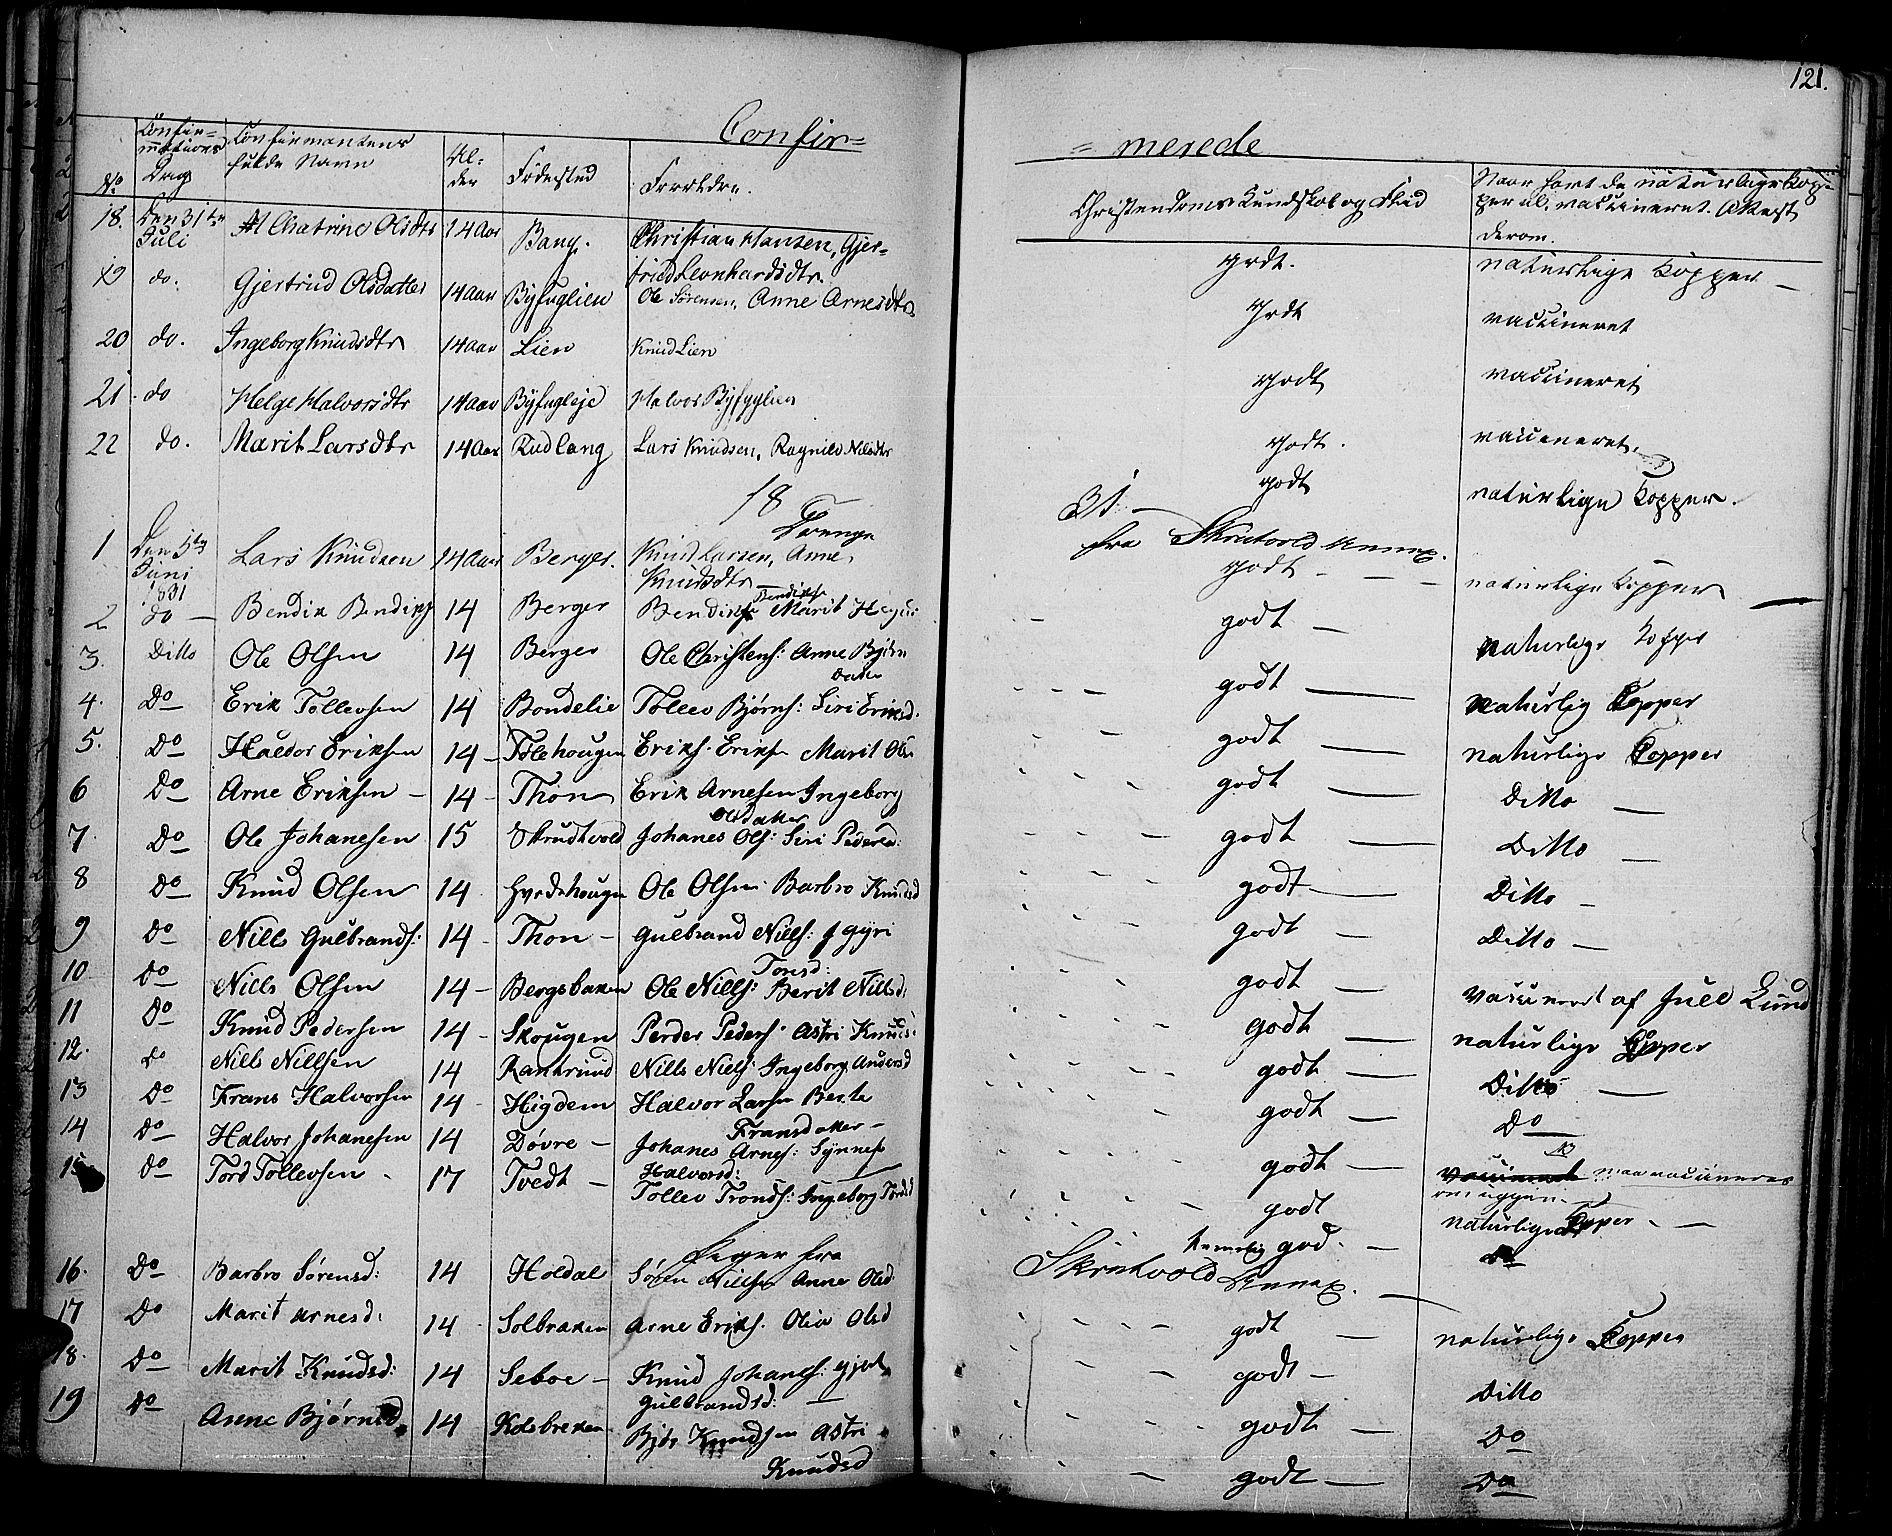 SAH, Nord-Aurdal prestekontor, Ministerialbok nr. 3, 1828-1841, s. 121